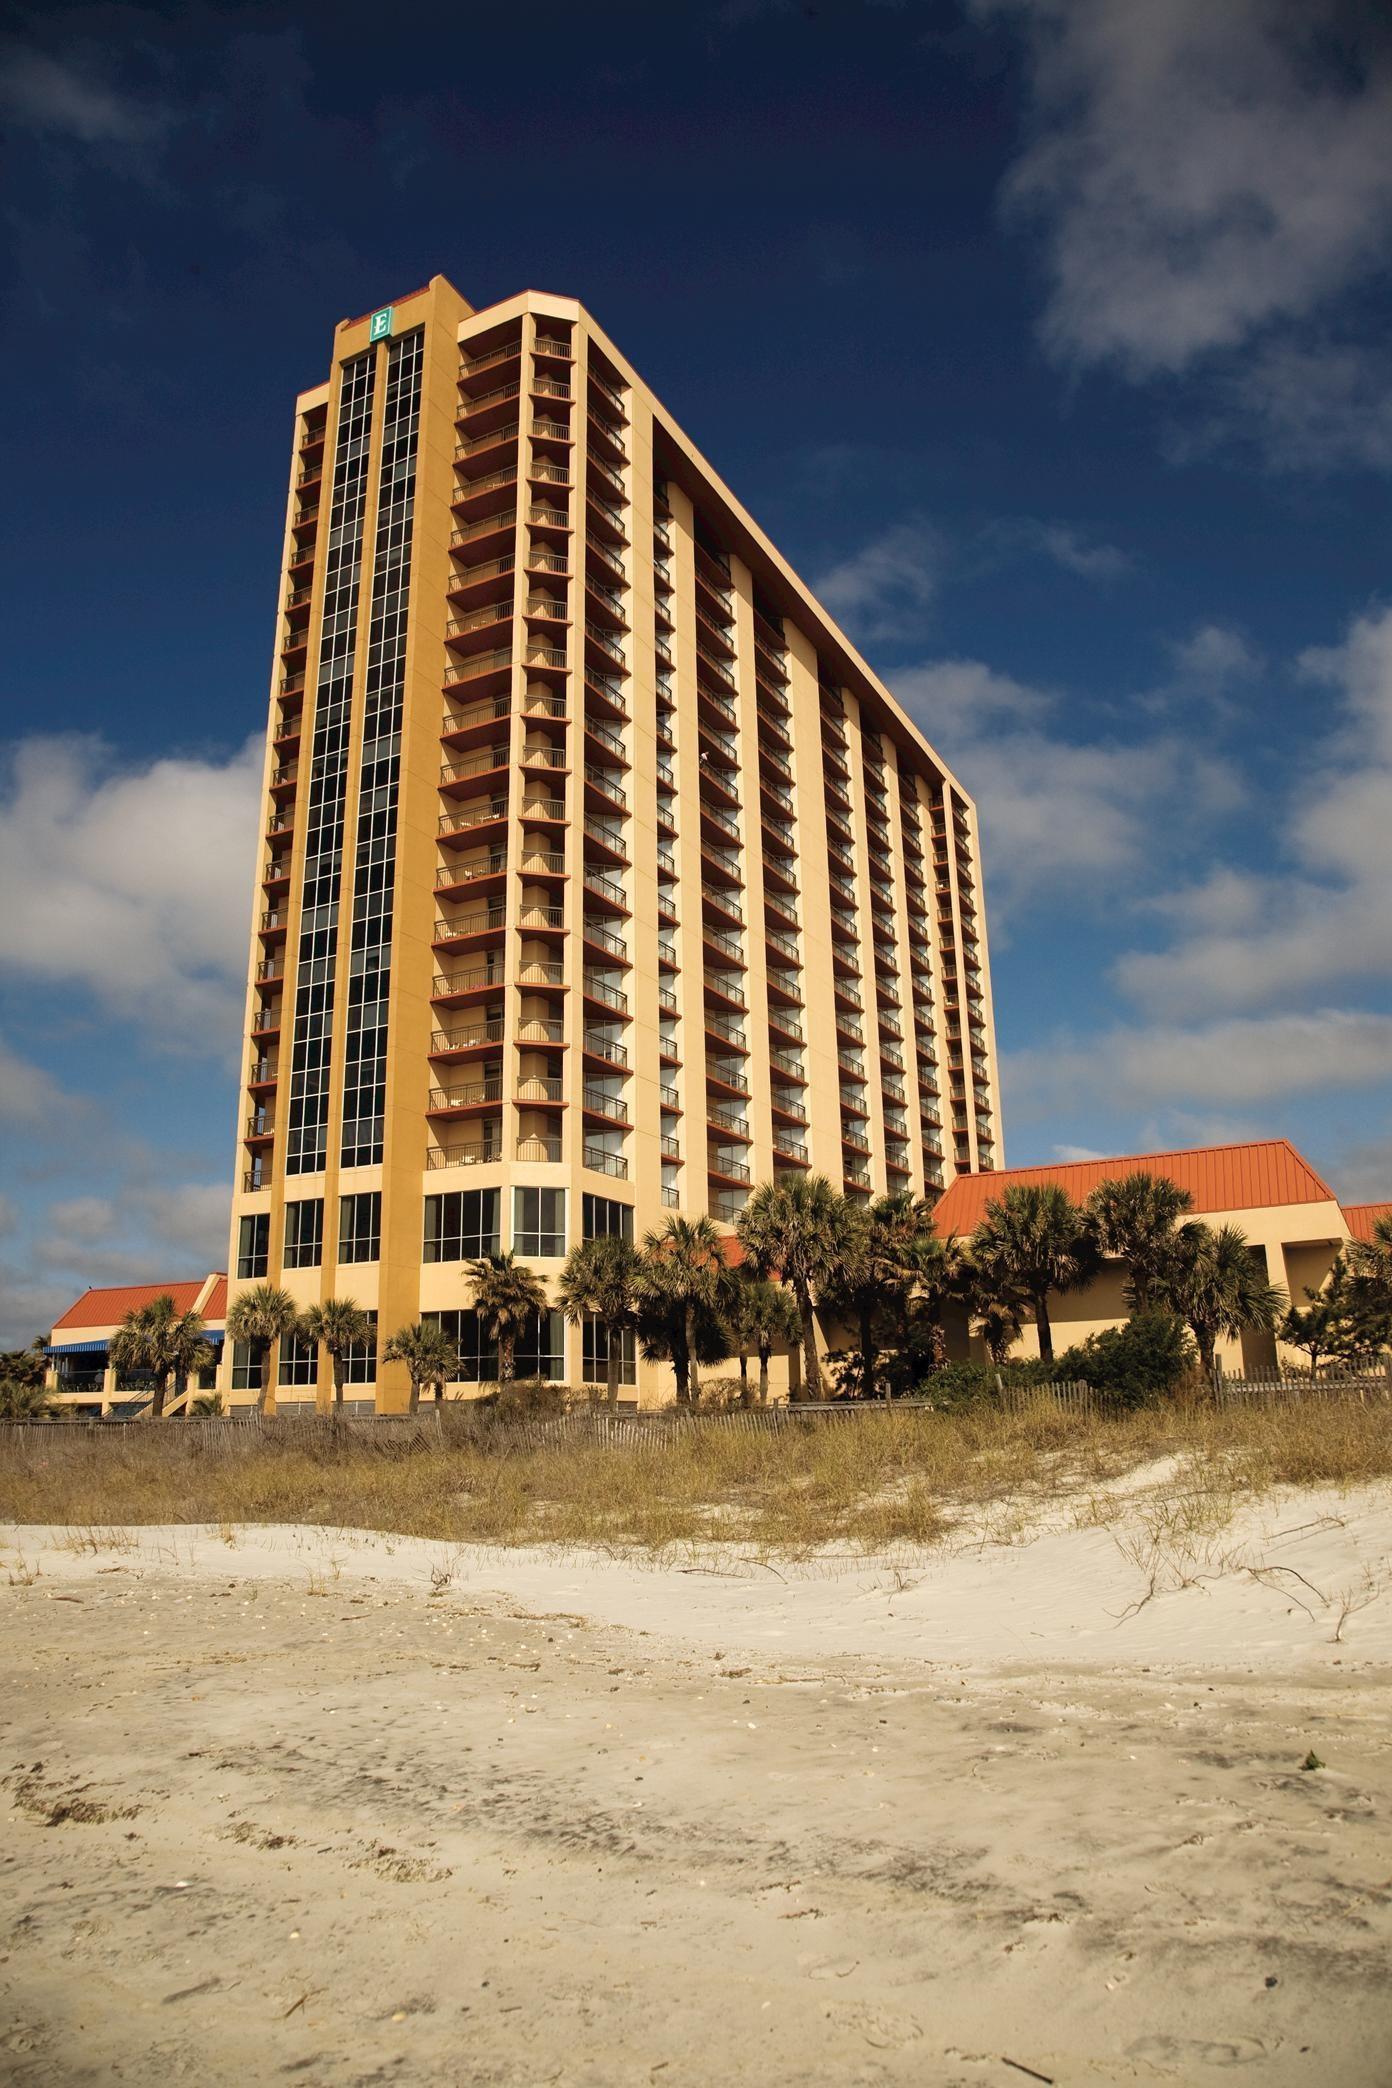 Embassy Suites Conference Center Myrtle Beach South Carolina